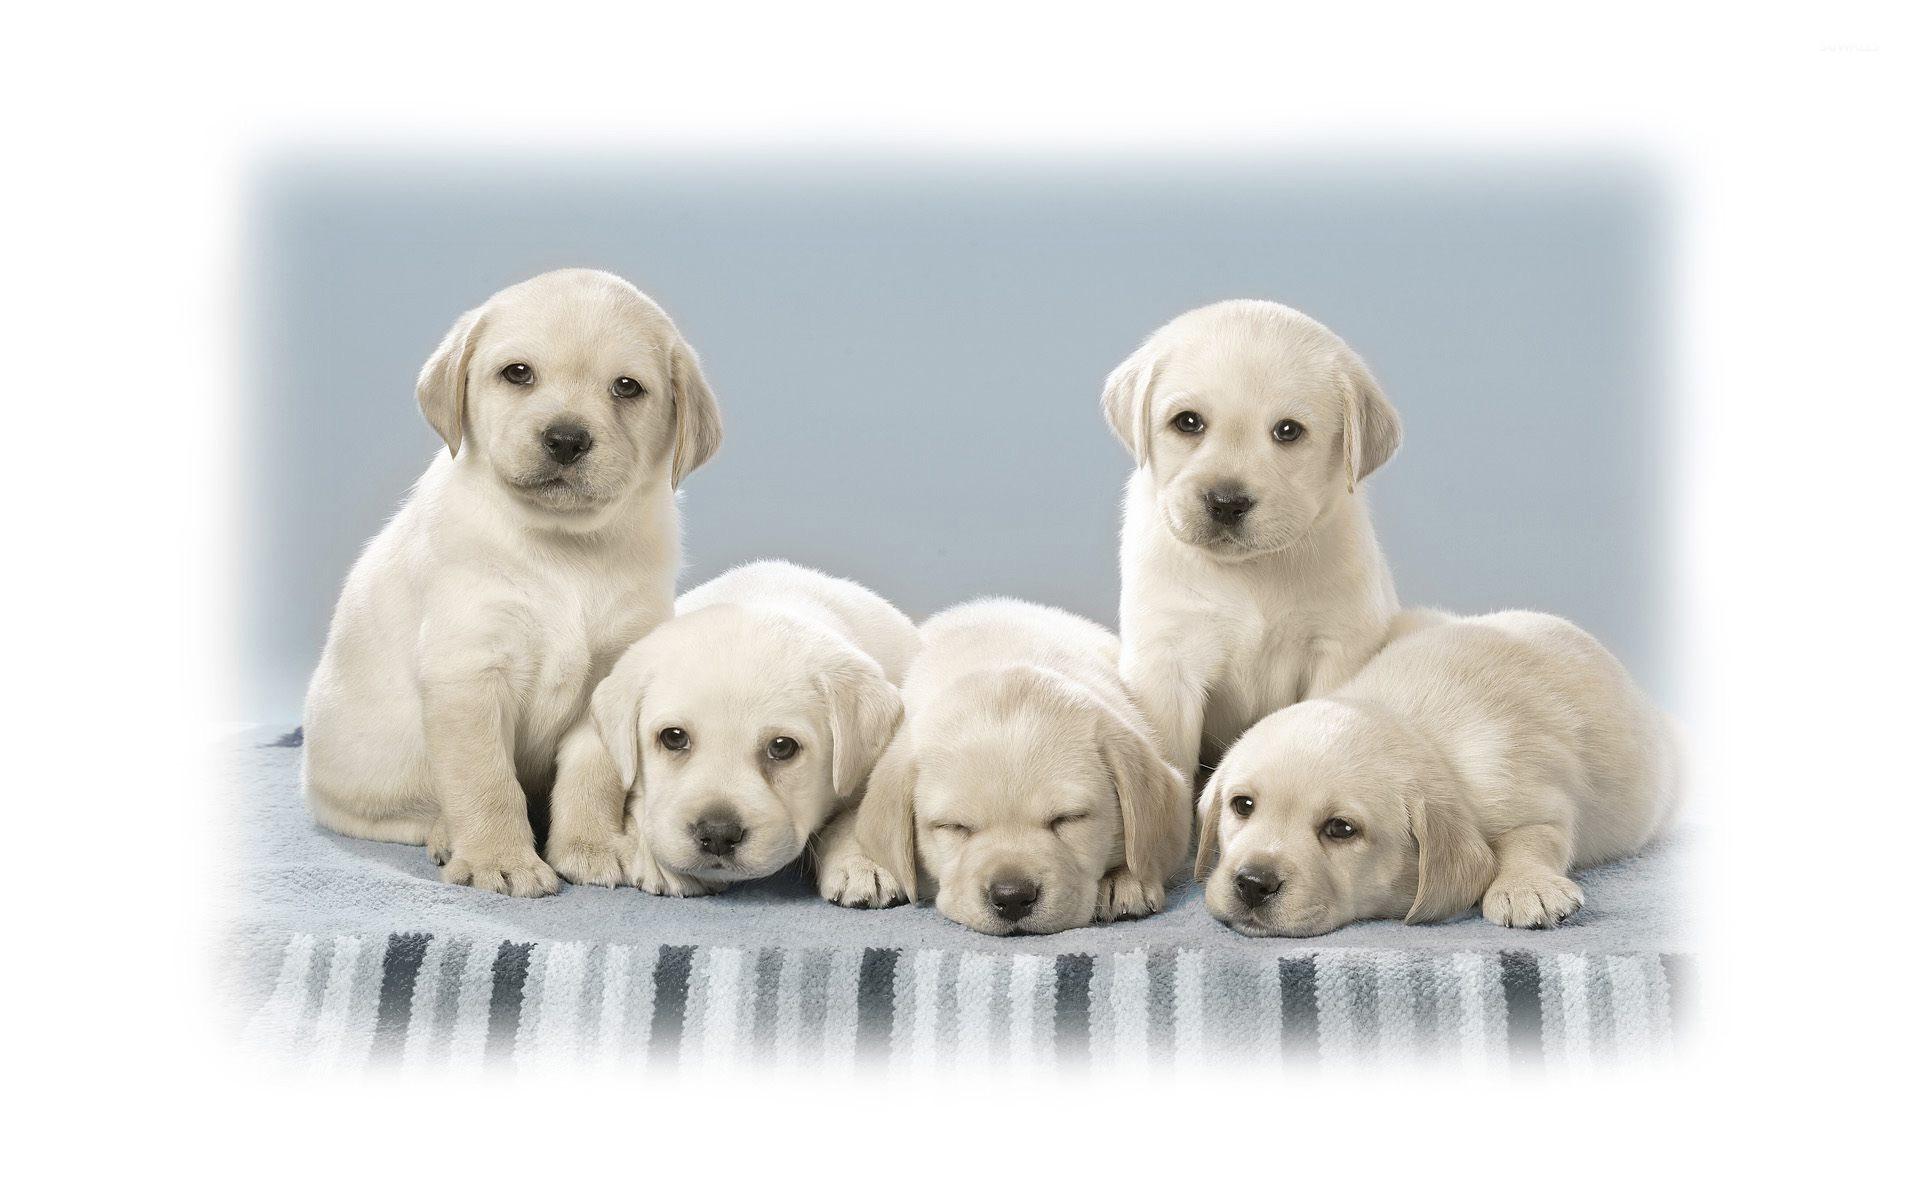 Cute Labrador Puppies Wallpaper Animal Wallpapers 25640